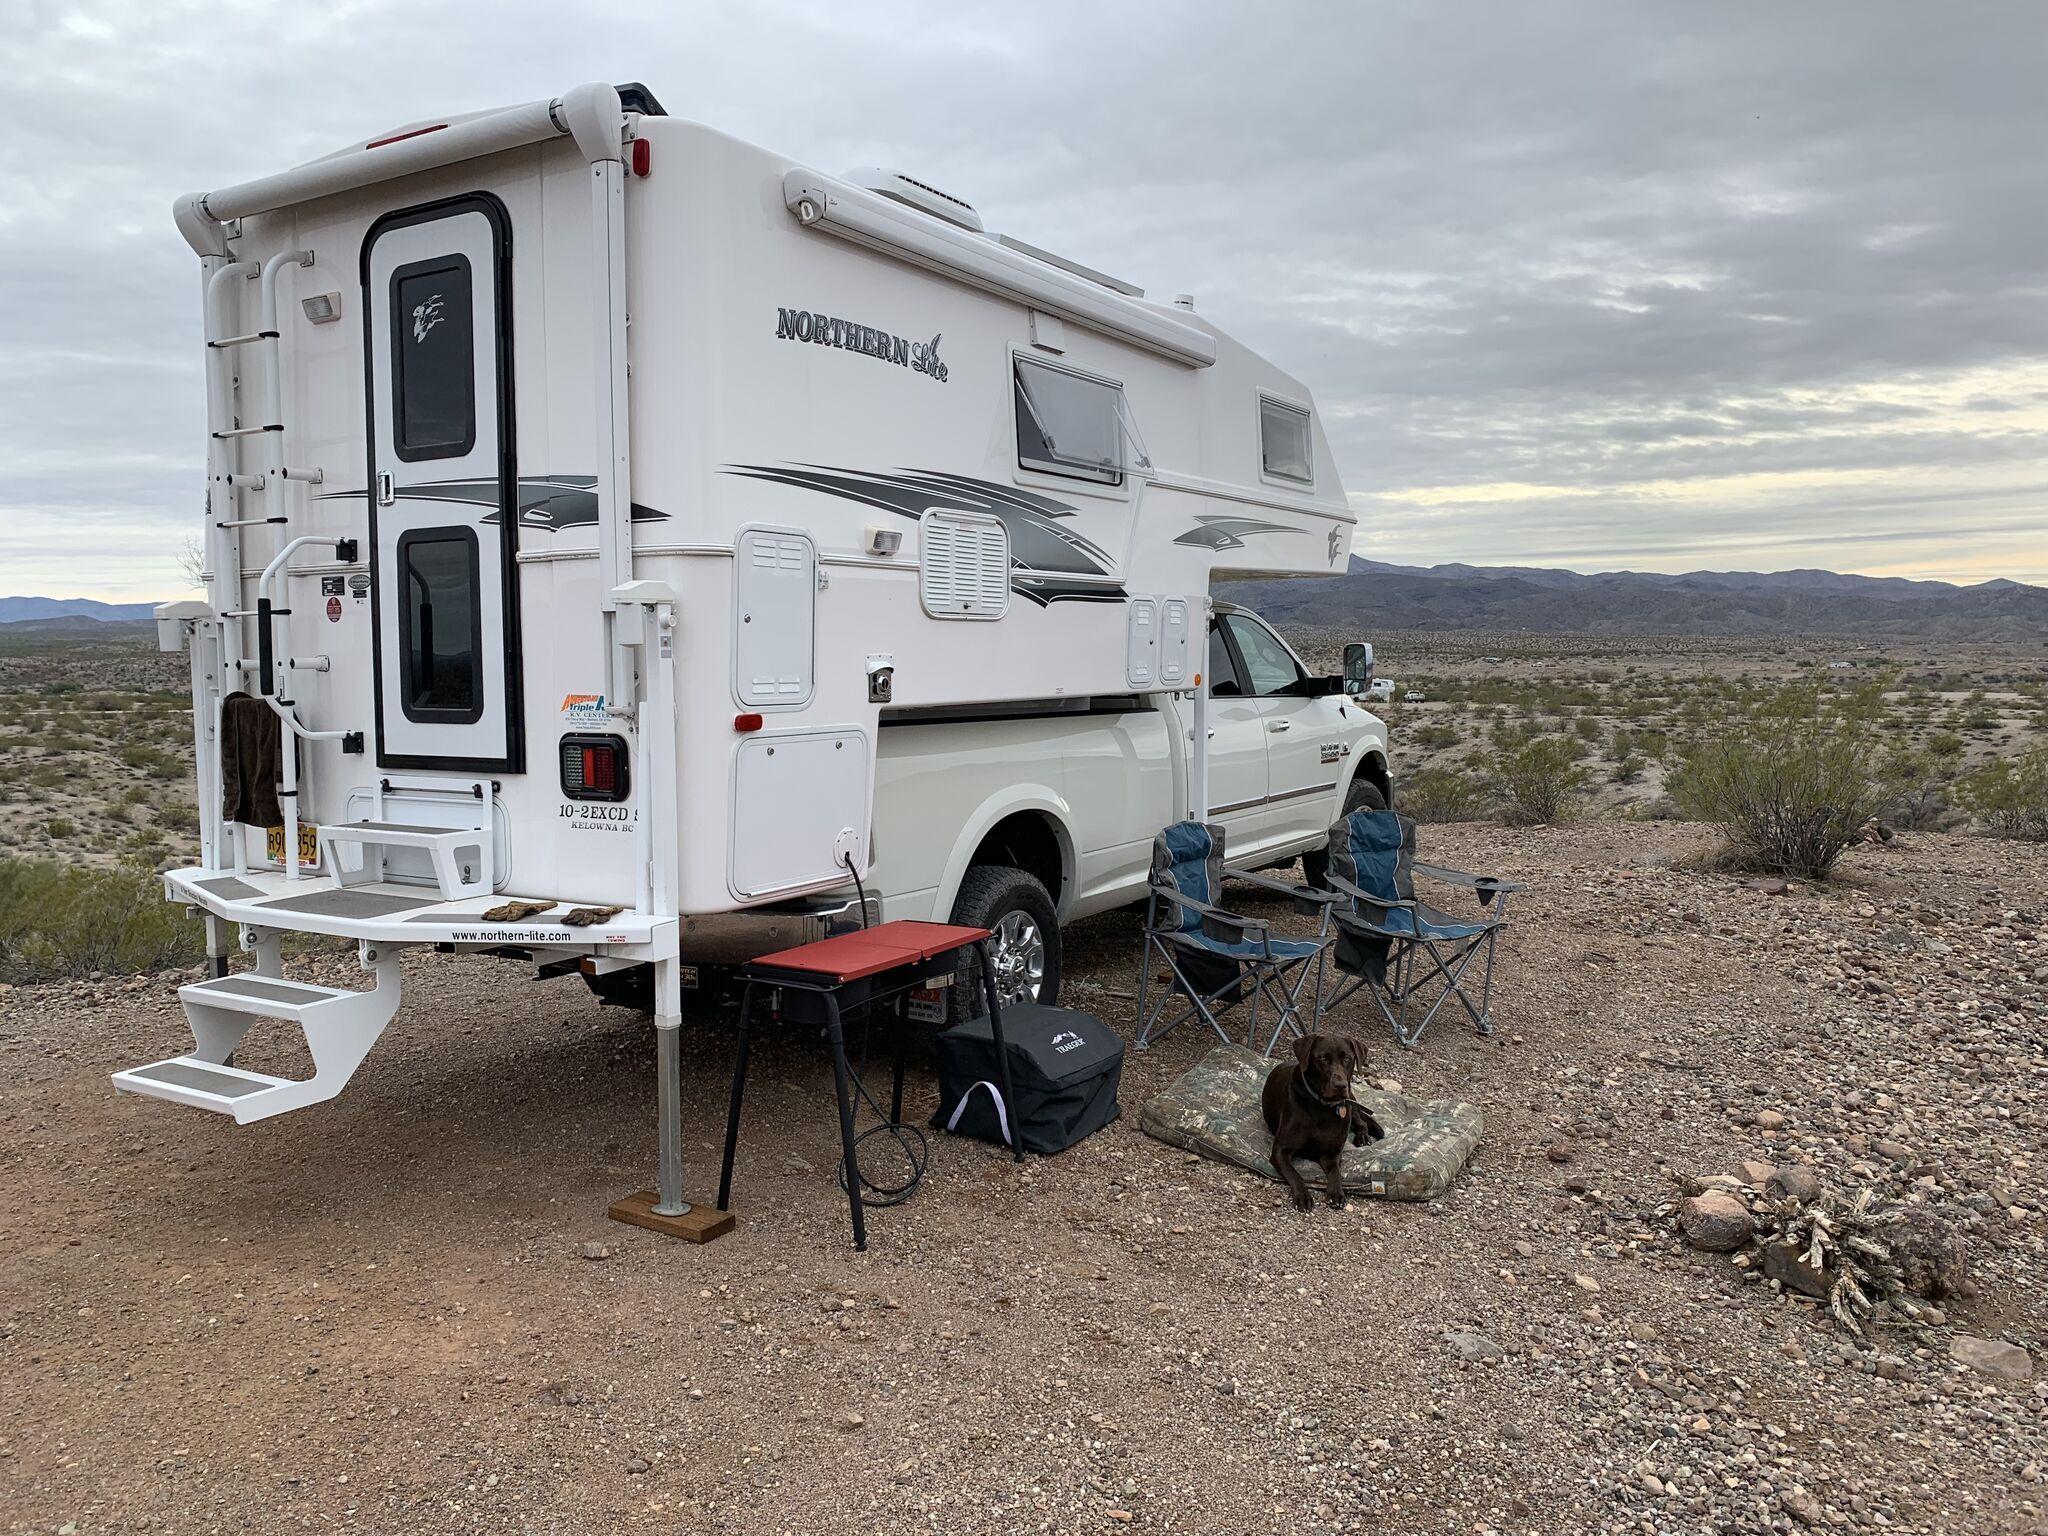 10 Reasons To Buy A Northern Lite Slide In Camper Built Truck